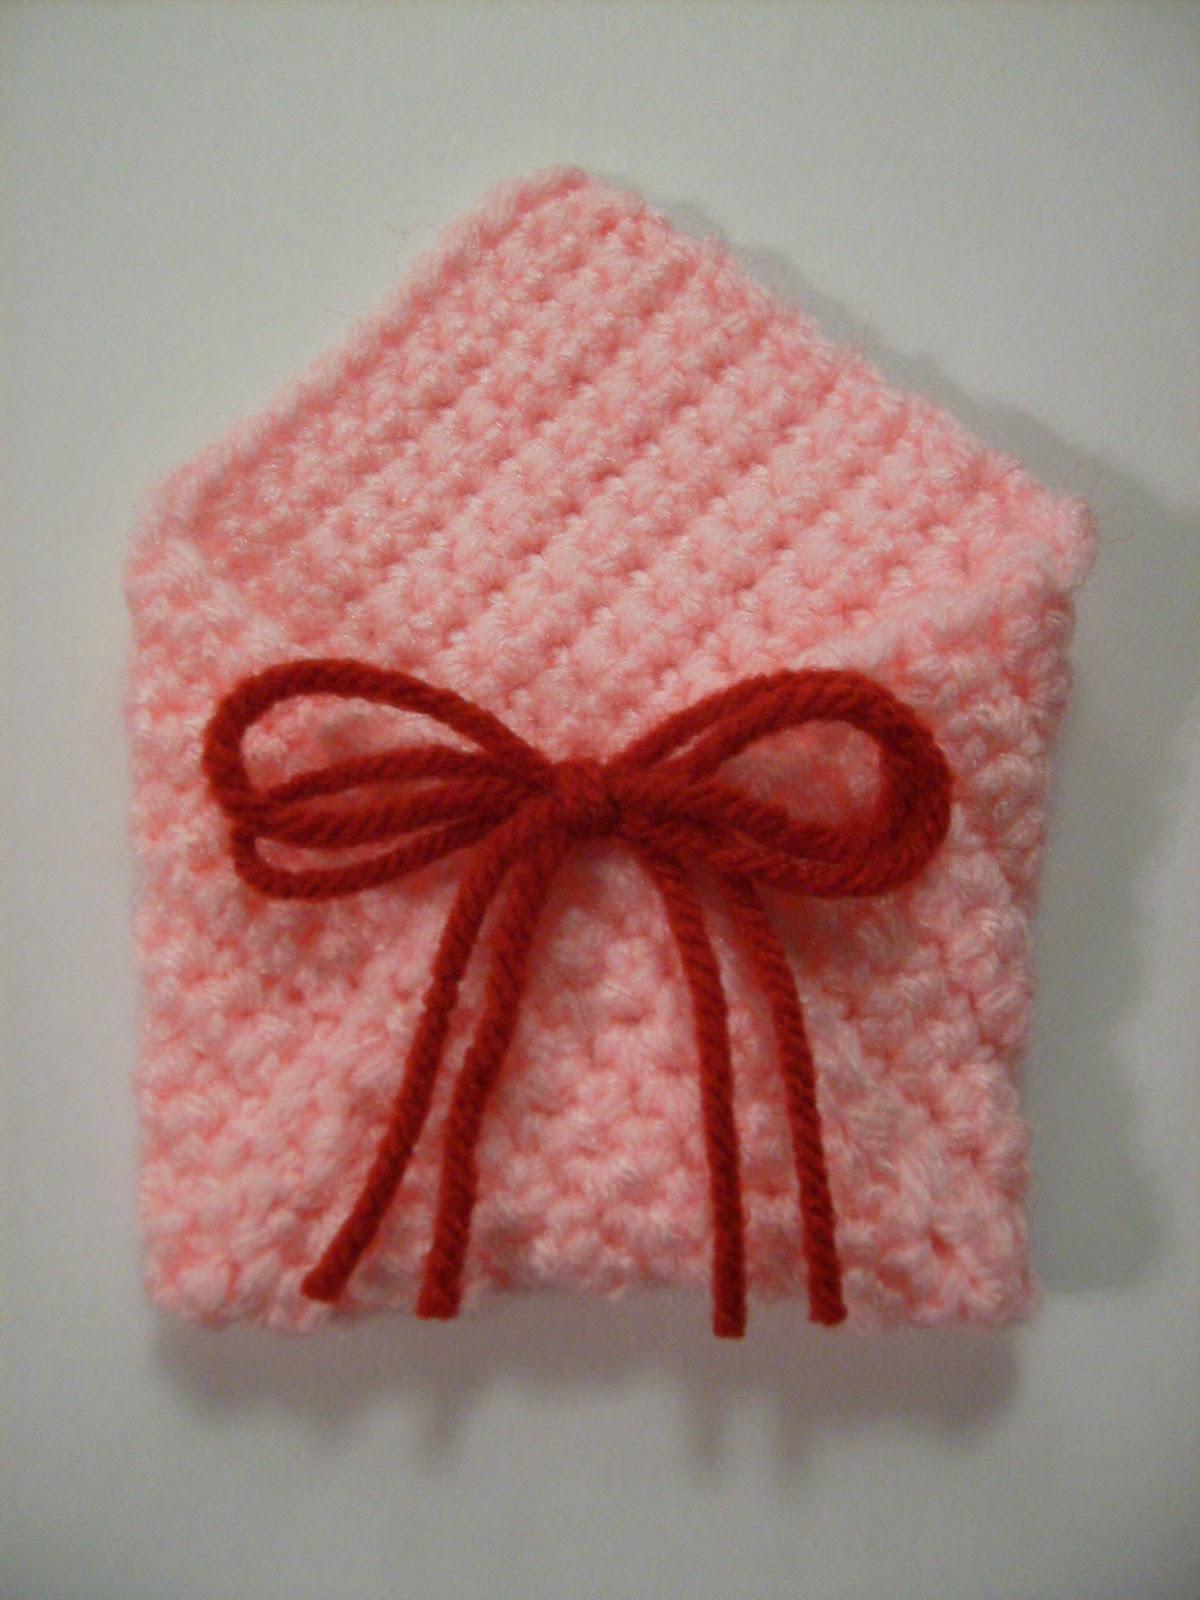 Crochet Patterns Valentines Day : Crochet Carnival: Free Valentines Day Mini Envelope Crochet Pattern